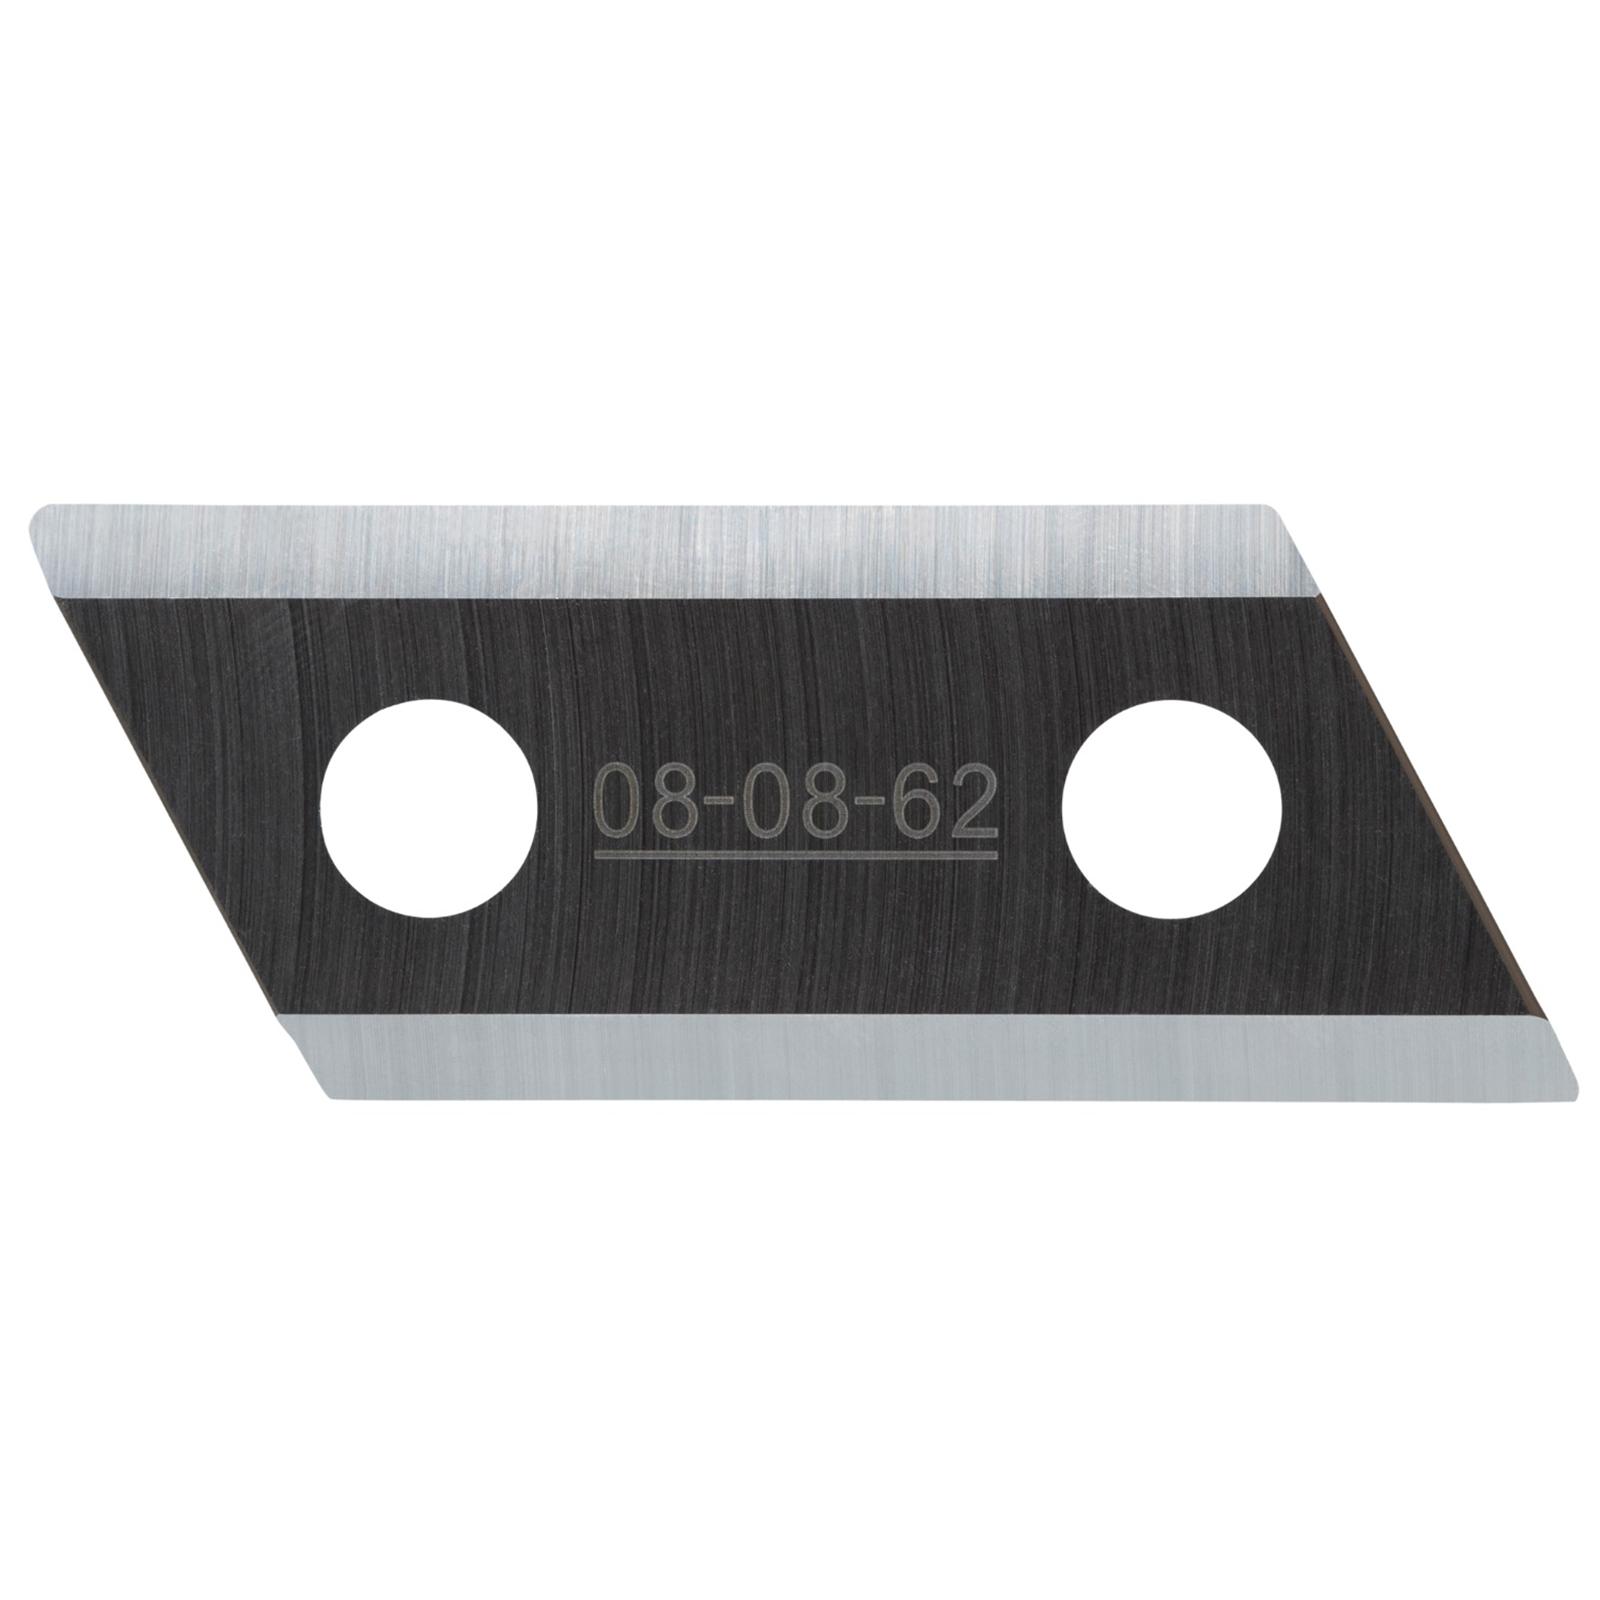 Ryobi Mulching Shredder Replacement Blade